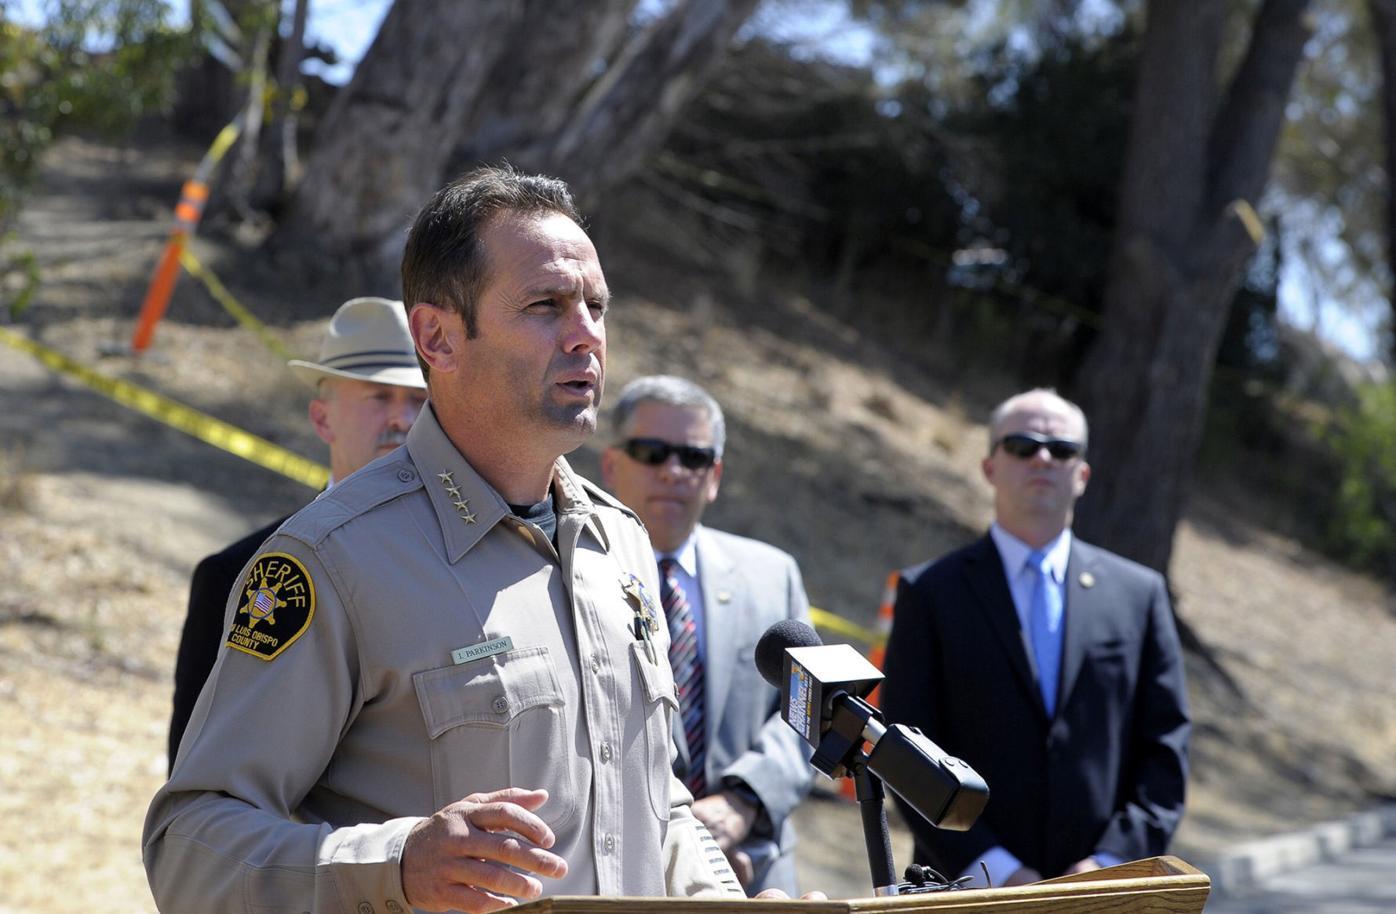 San Luis Obispo Sheriff's Department lists evidence, steps taken in 1996 Kristin Smart disappearance